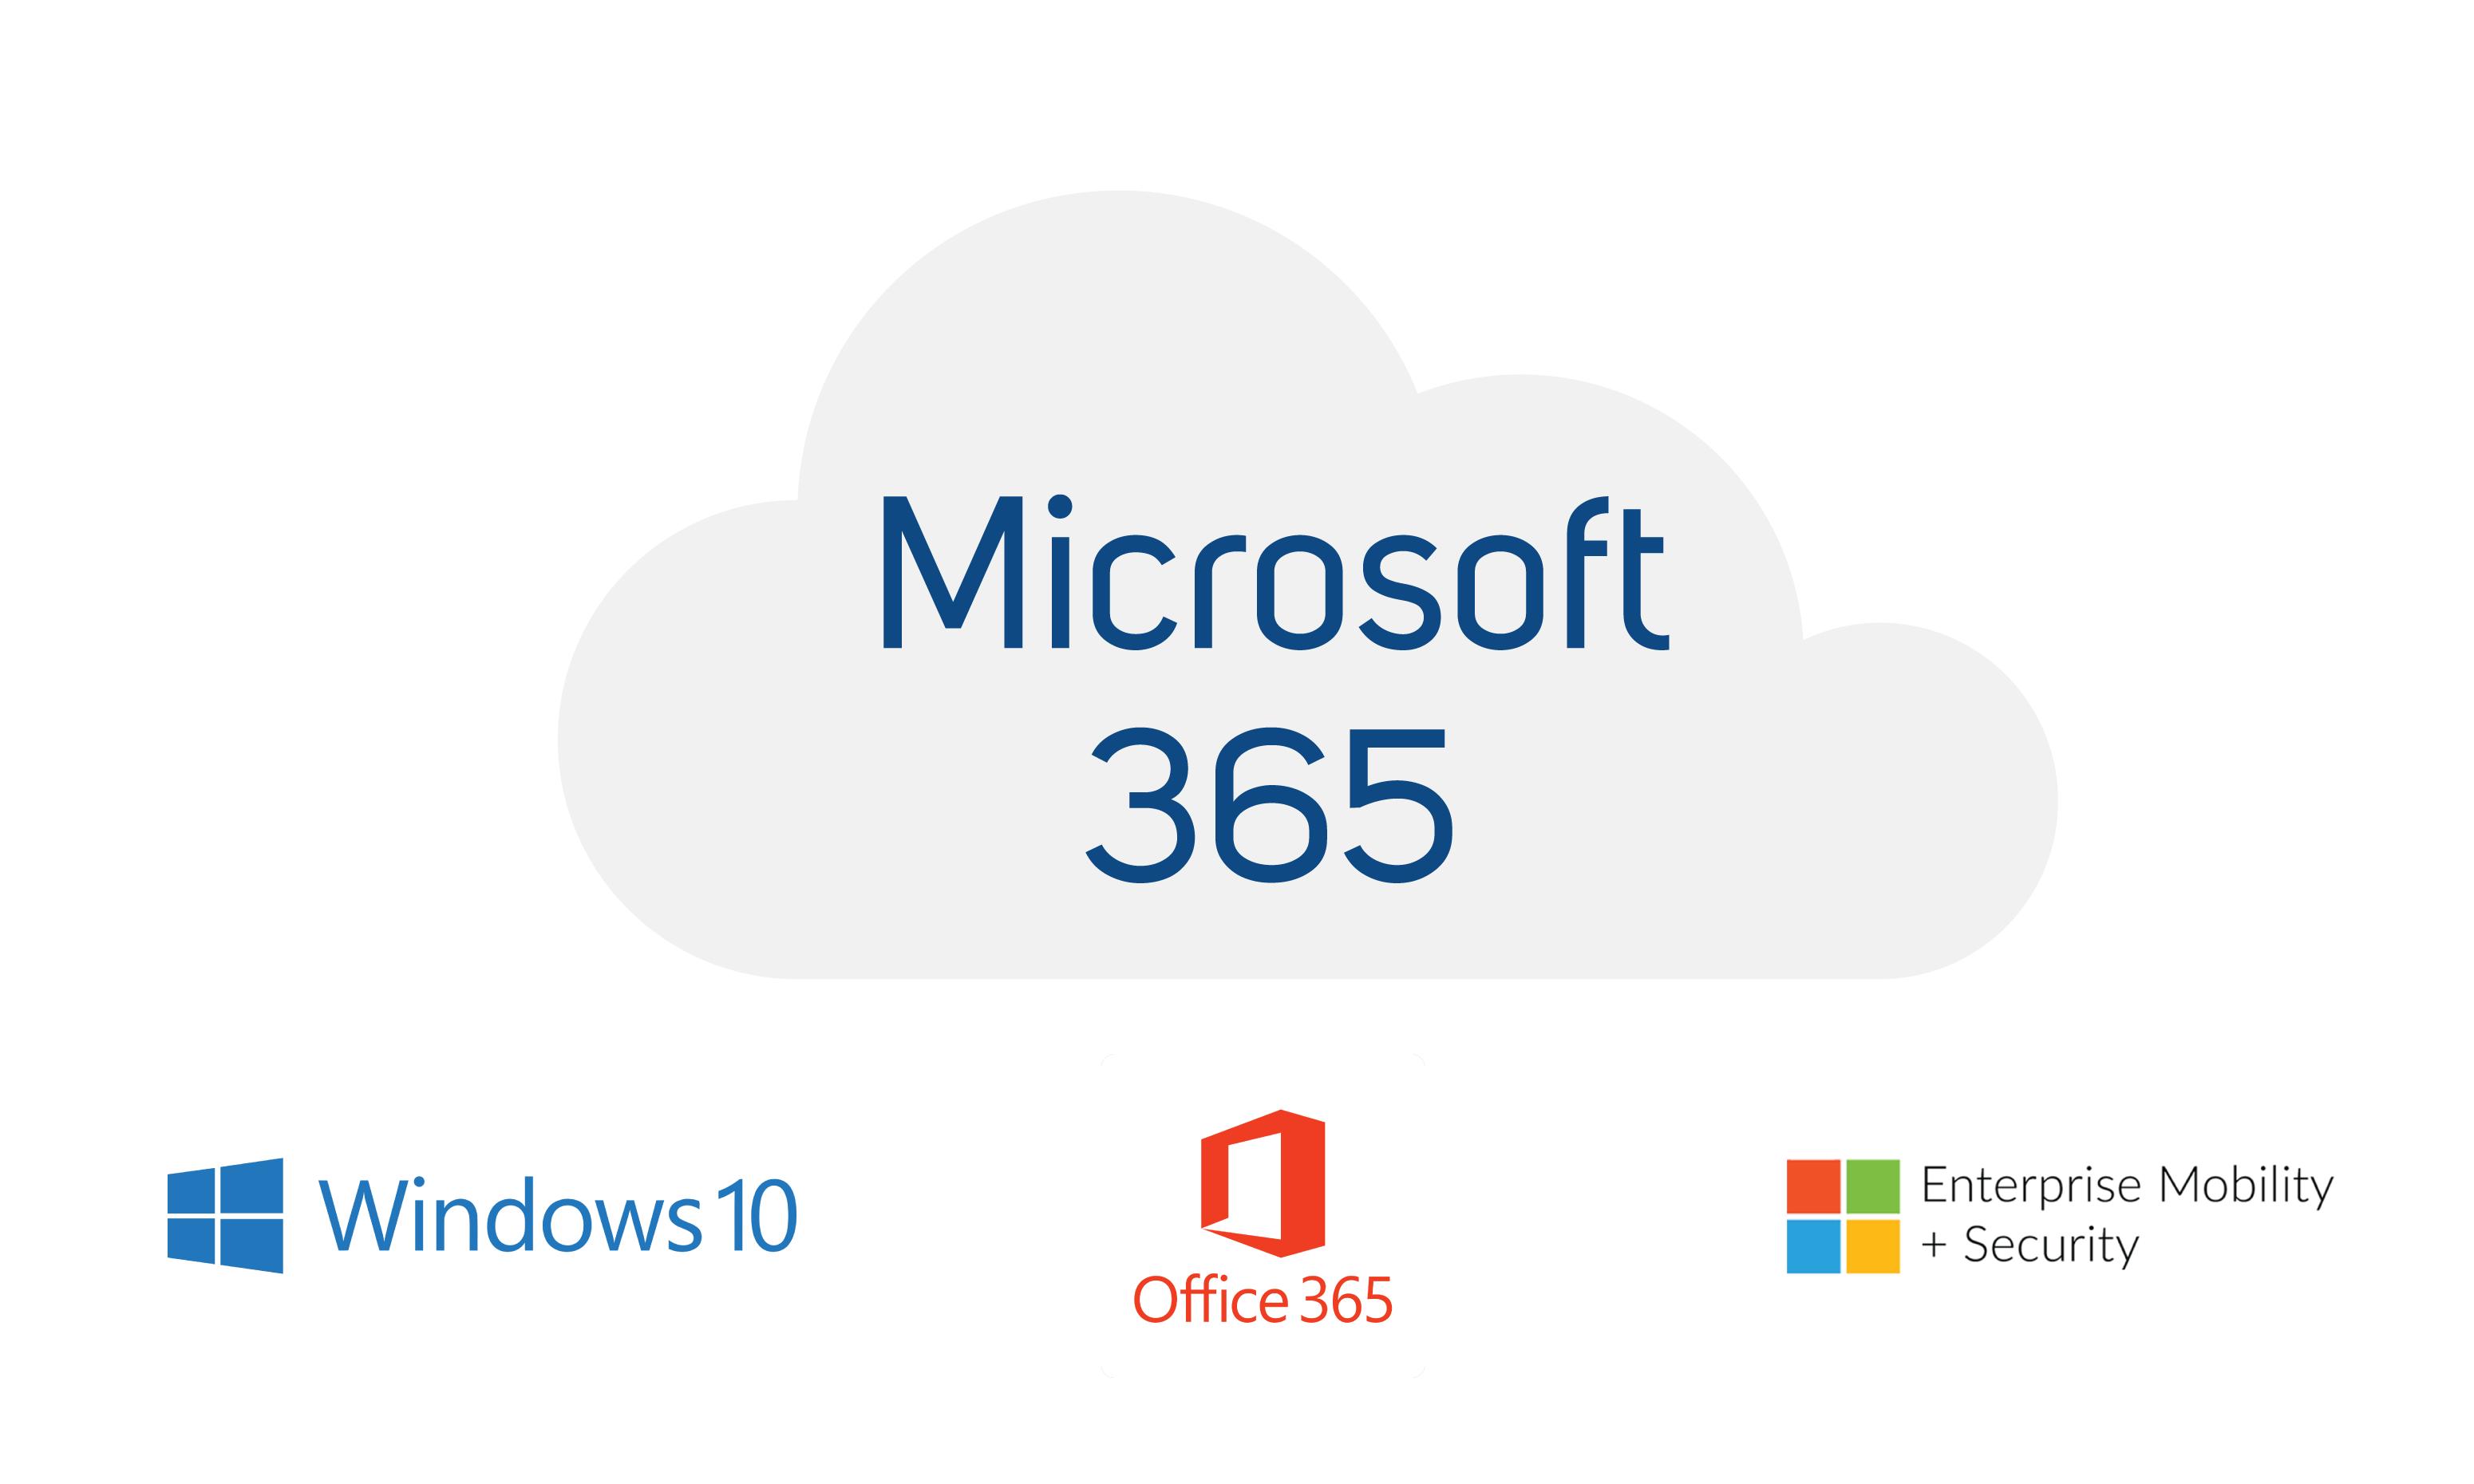 https://www.pedholtlab.com/wp-content/uploads/2019/08/Microsoft365-logo.png